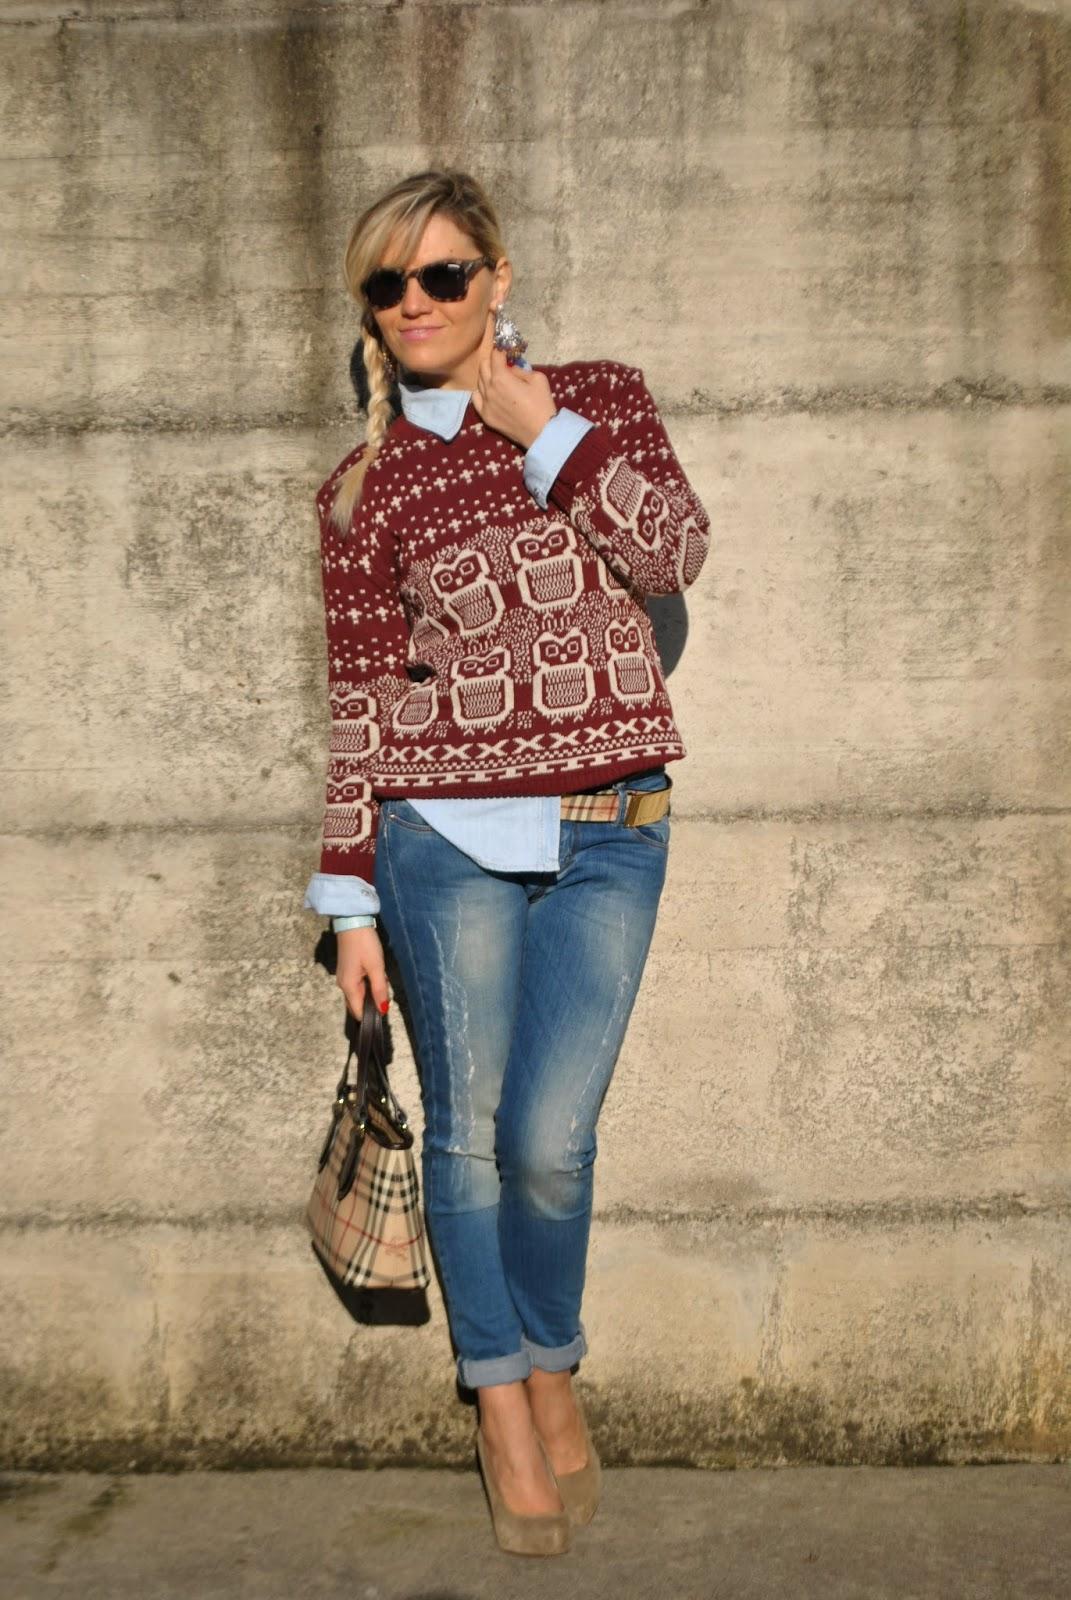 outfit maglione,camicia denim,jeans skinny,borsa burberry,cintura burberry,abbinamento jeans e tacchi,acconciatura treccia,mariafelicia magno fashion blogger,colorblock by felym,fashion blog italiani,outfit gennaio 2015. abbinare maglione e camicia,outfit burgundy,   abbinare maglione e camicia,outfit burgundy outfit jeans outfit camicia e maglione outfit jeans skinny abbinamenti jeans skinny jeans e tacchi come abbinare jeans e tacchi come abbinare jeans e maglione maglione gufi outfit burgundy come abbinare il bordeaux outfit jeans casual outfit da ufficio con jeans borsa burberry cintura burberry acconciatura treccia laterale how to wear jeans to work jeans and heels sewater and shirt how to wear jeans and heels how to wear shirt and sweater fashion bloggers italy italian fashion bloggers italian girls girls blonde girls braids burberry belt burberry bag outfit burberry outfit borsa burberry outfit cintura burberry